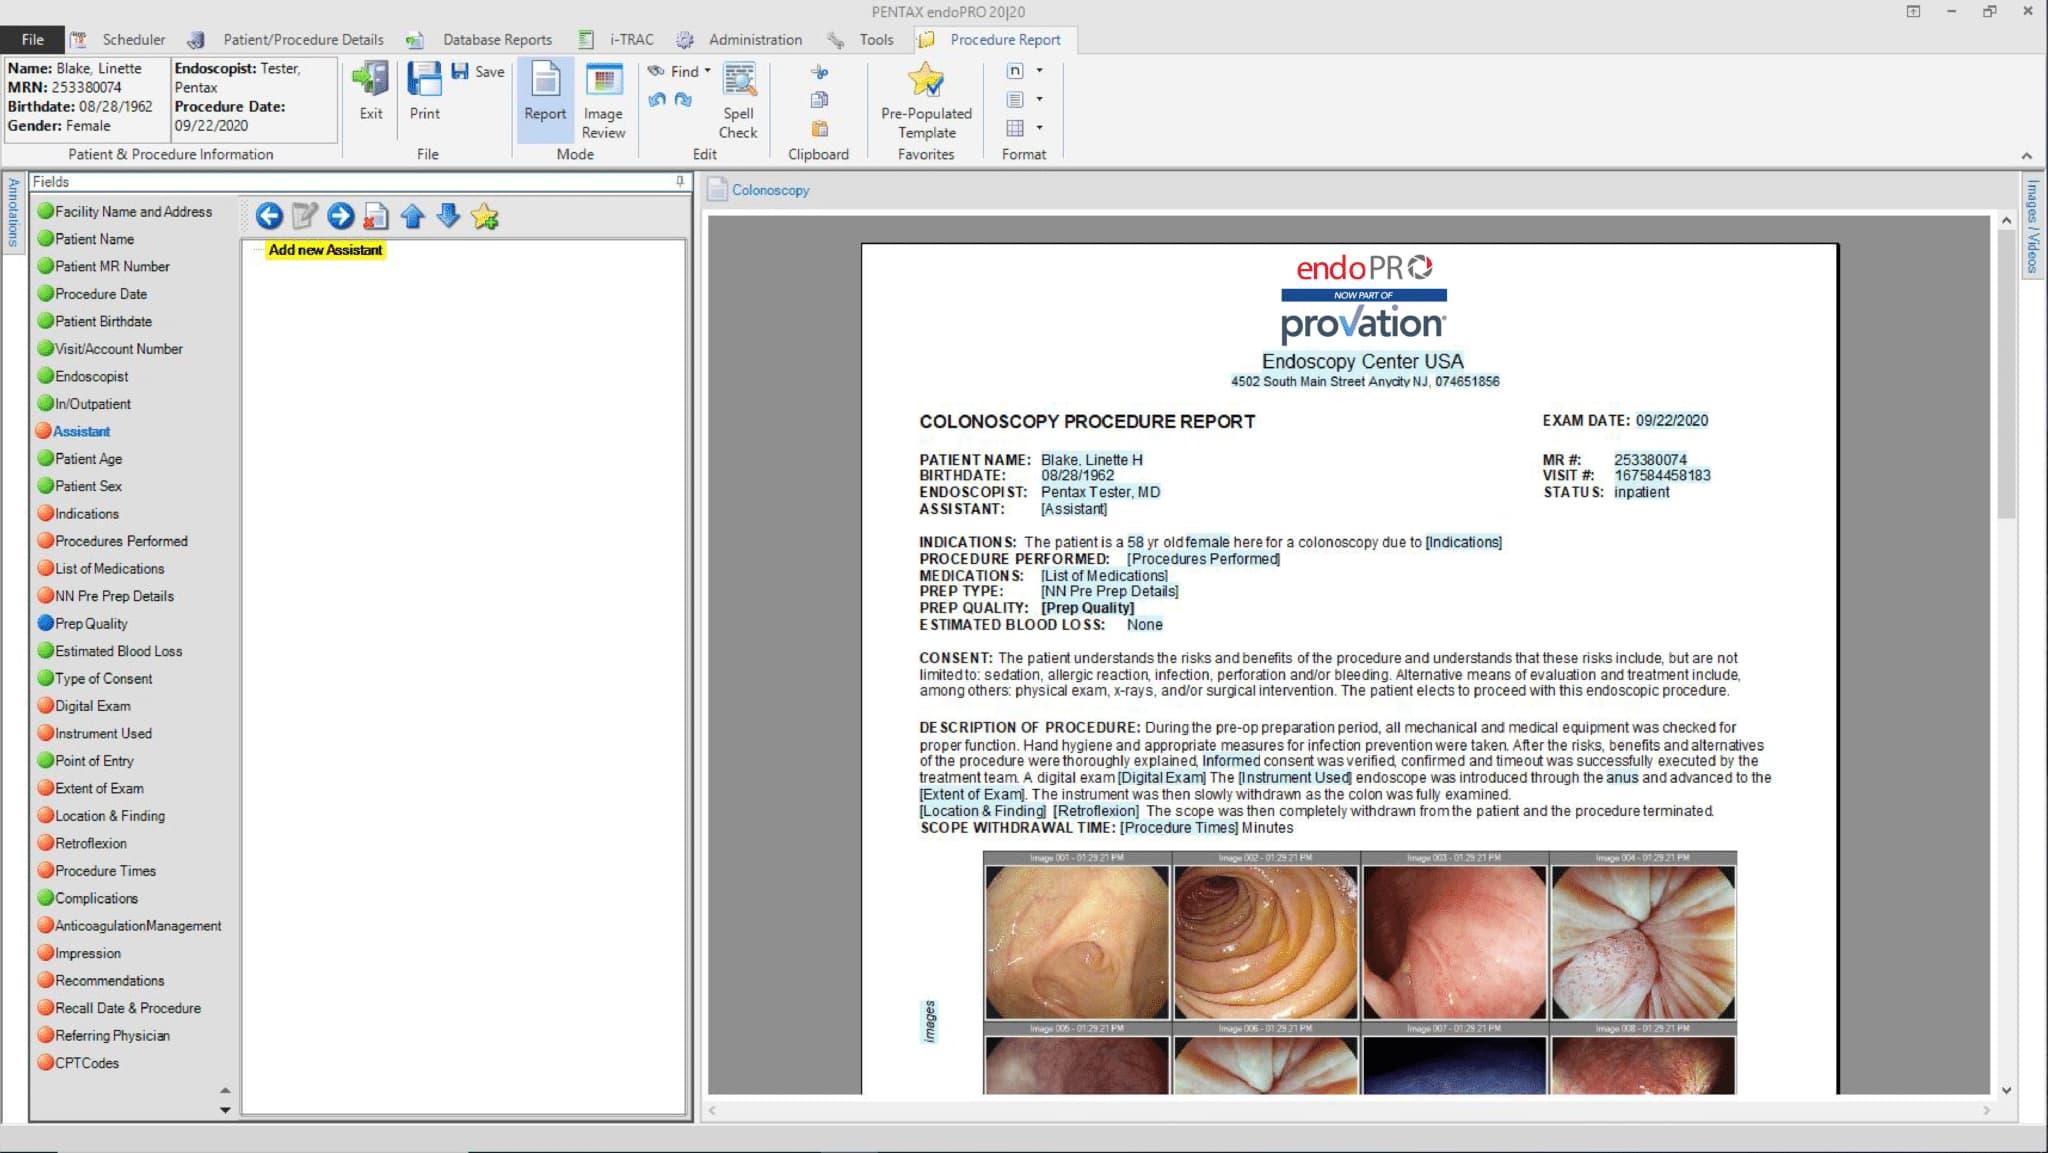 Provation endoPRO Procedure Report